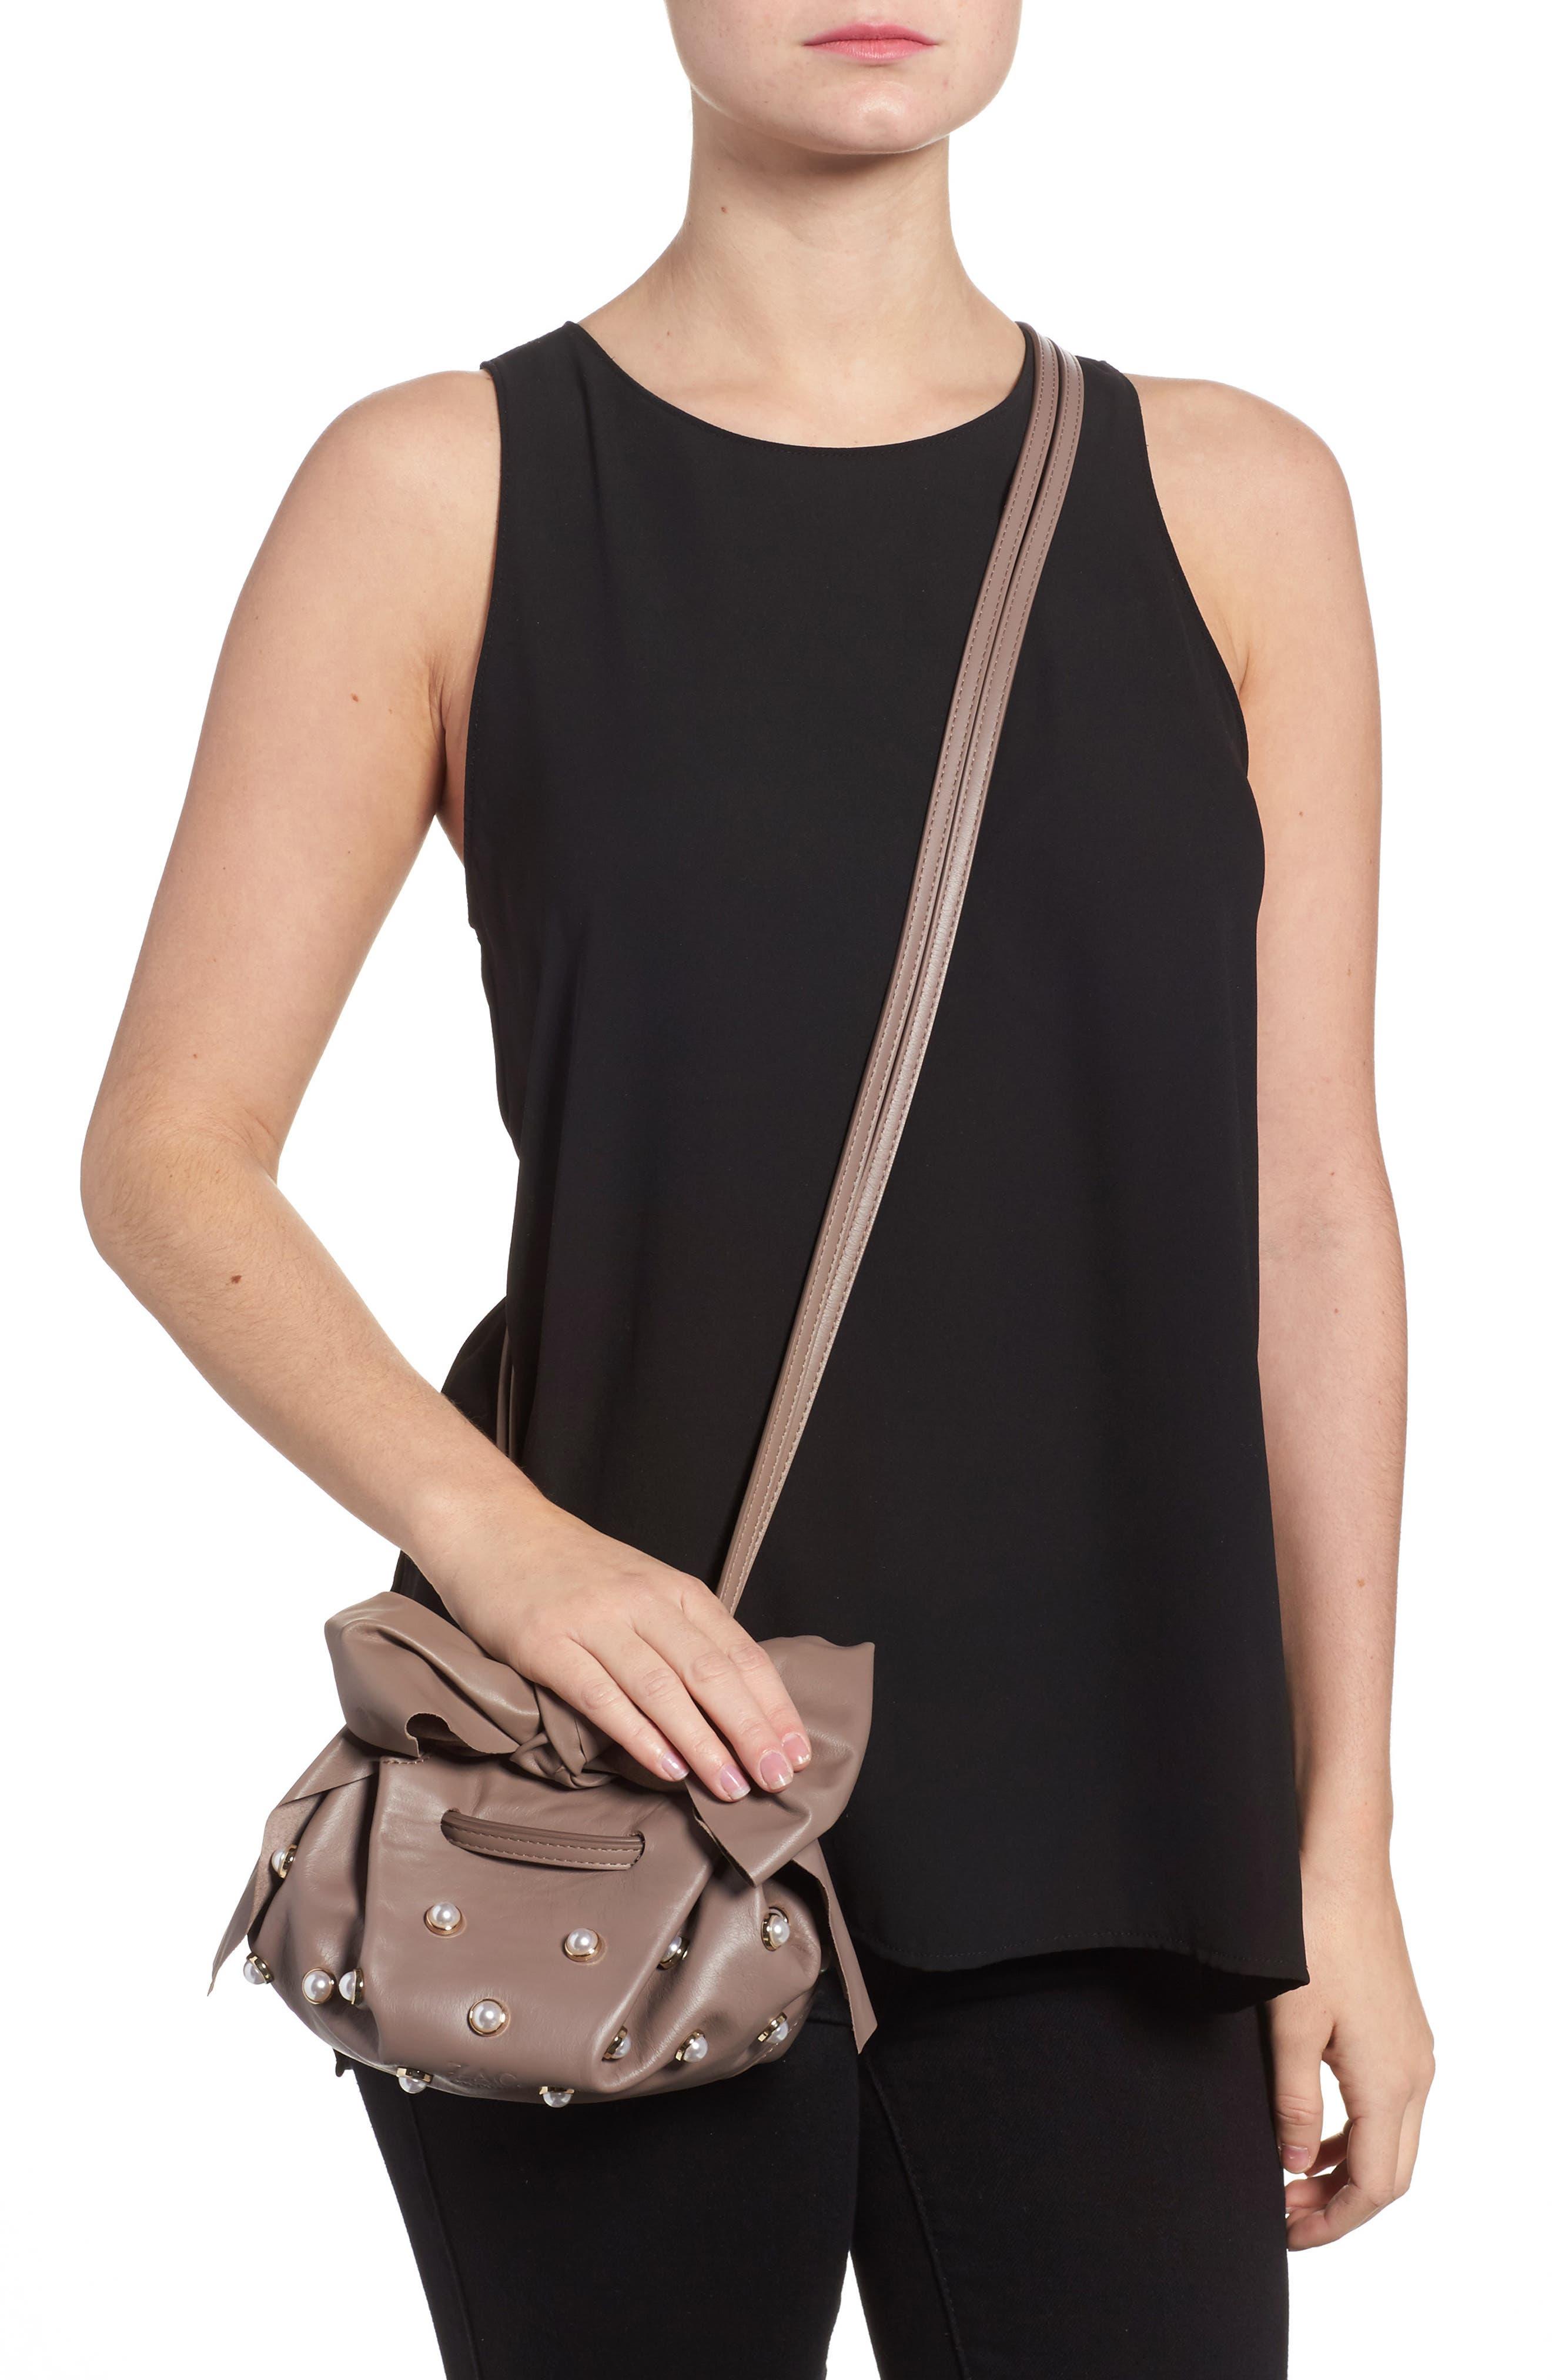 Soirée Imitation Pearl Lady Leather Crossbody Bag,                             Alternate thumbnail 2, color,                             530